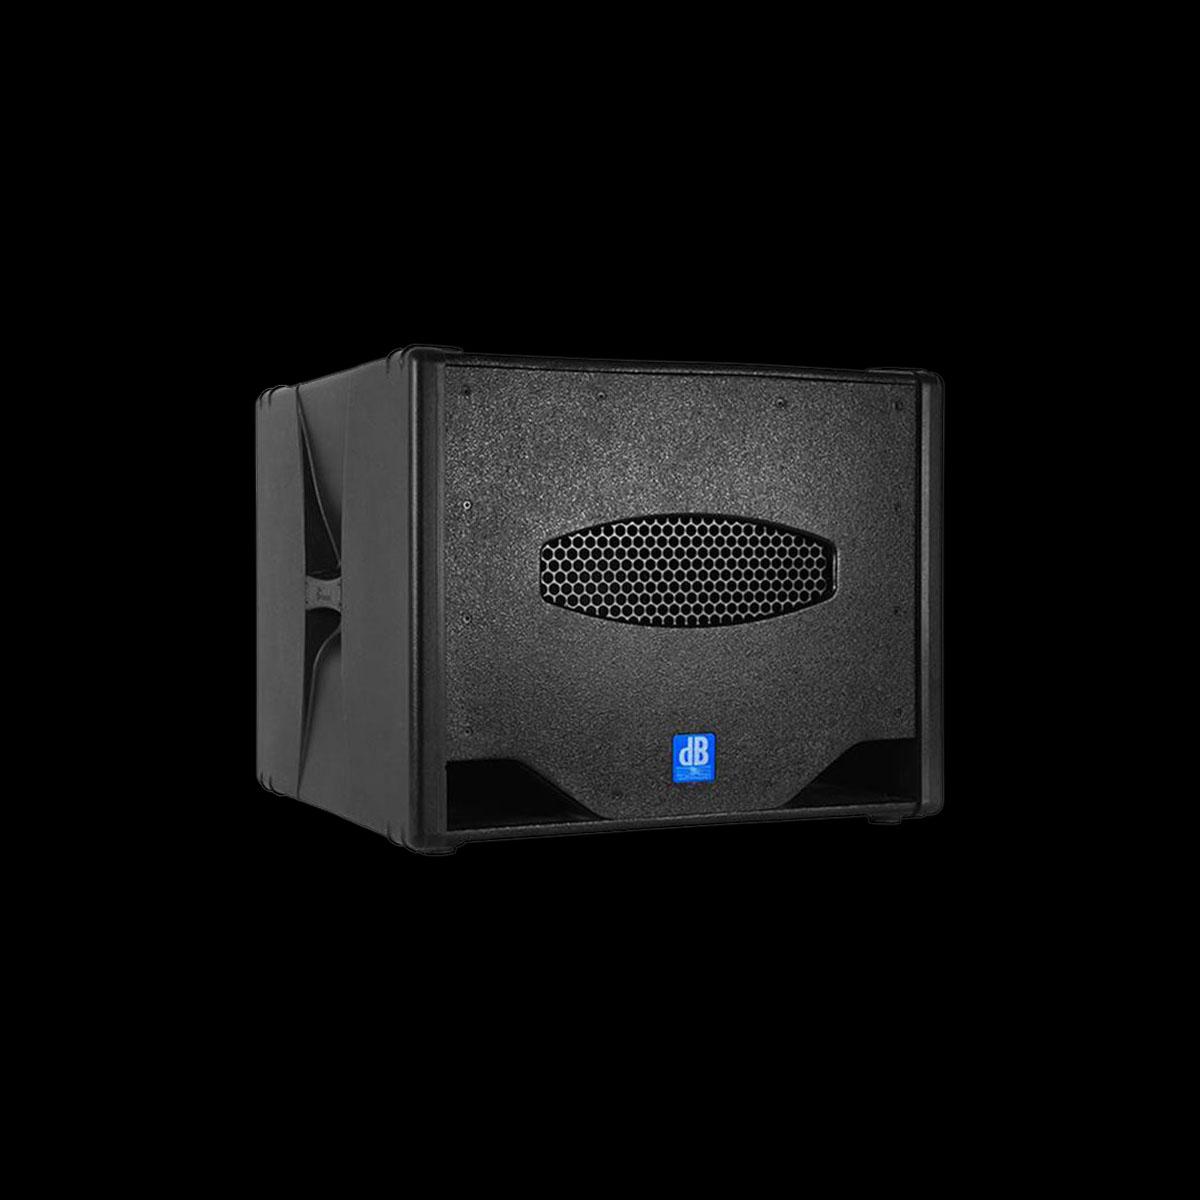 db technologies active subs sub808 d grille voor luidsprekerhoes baseline